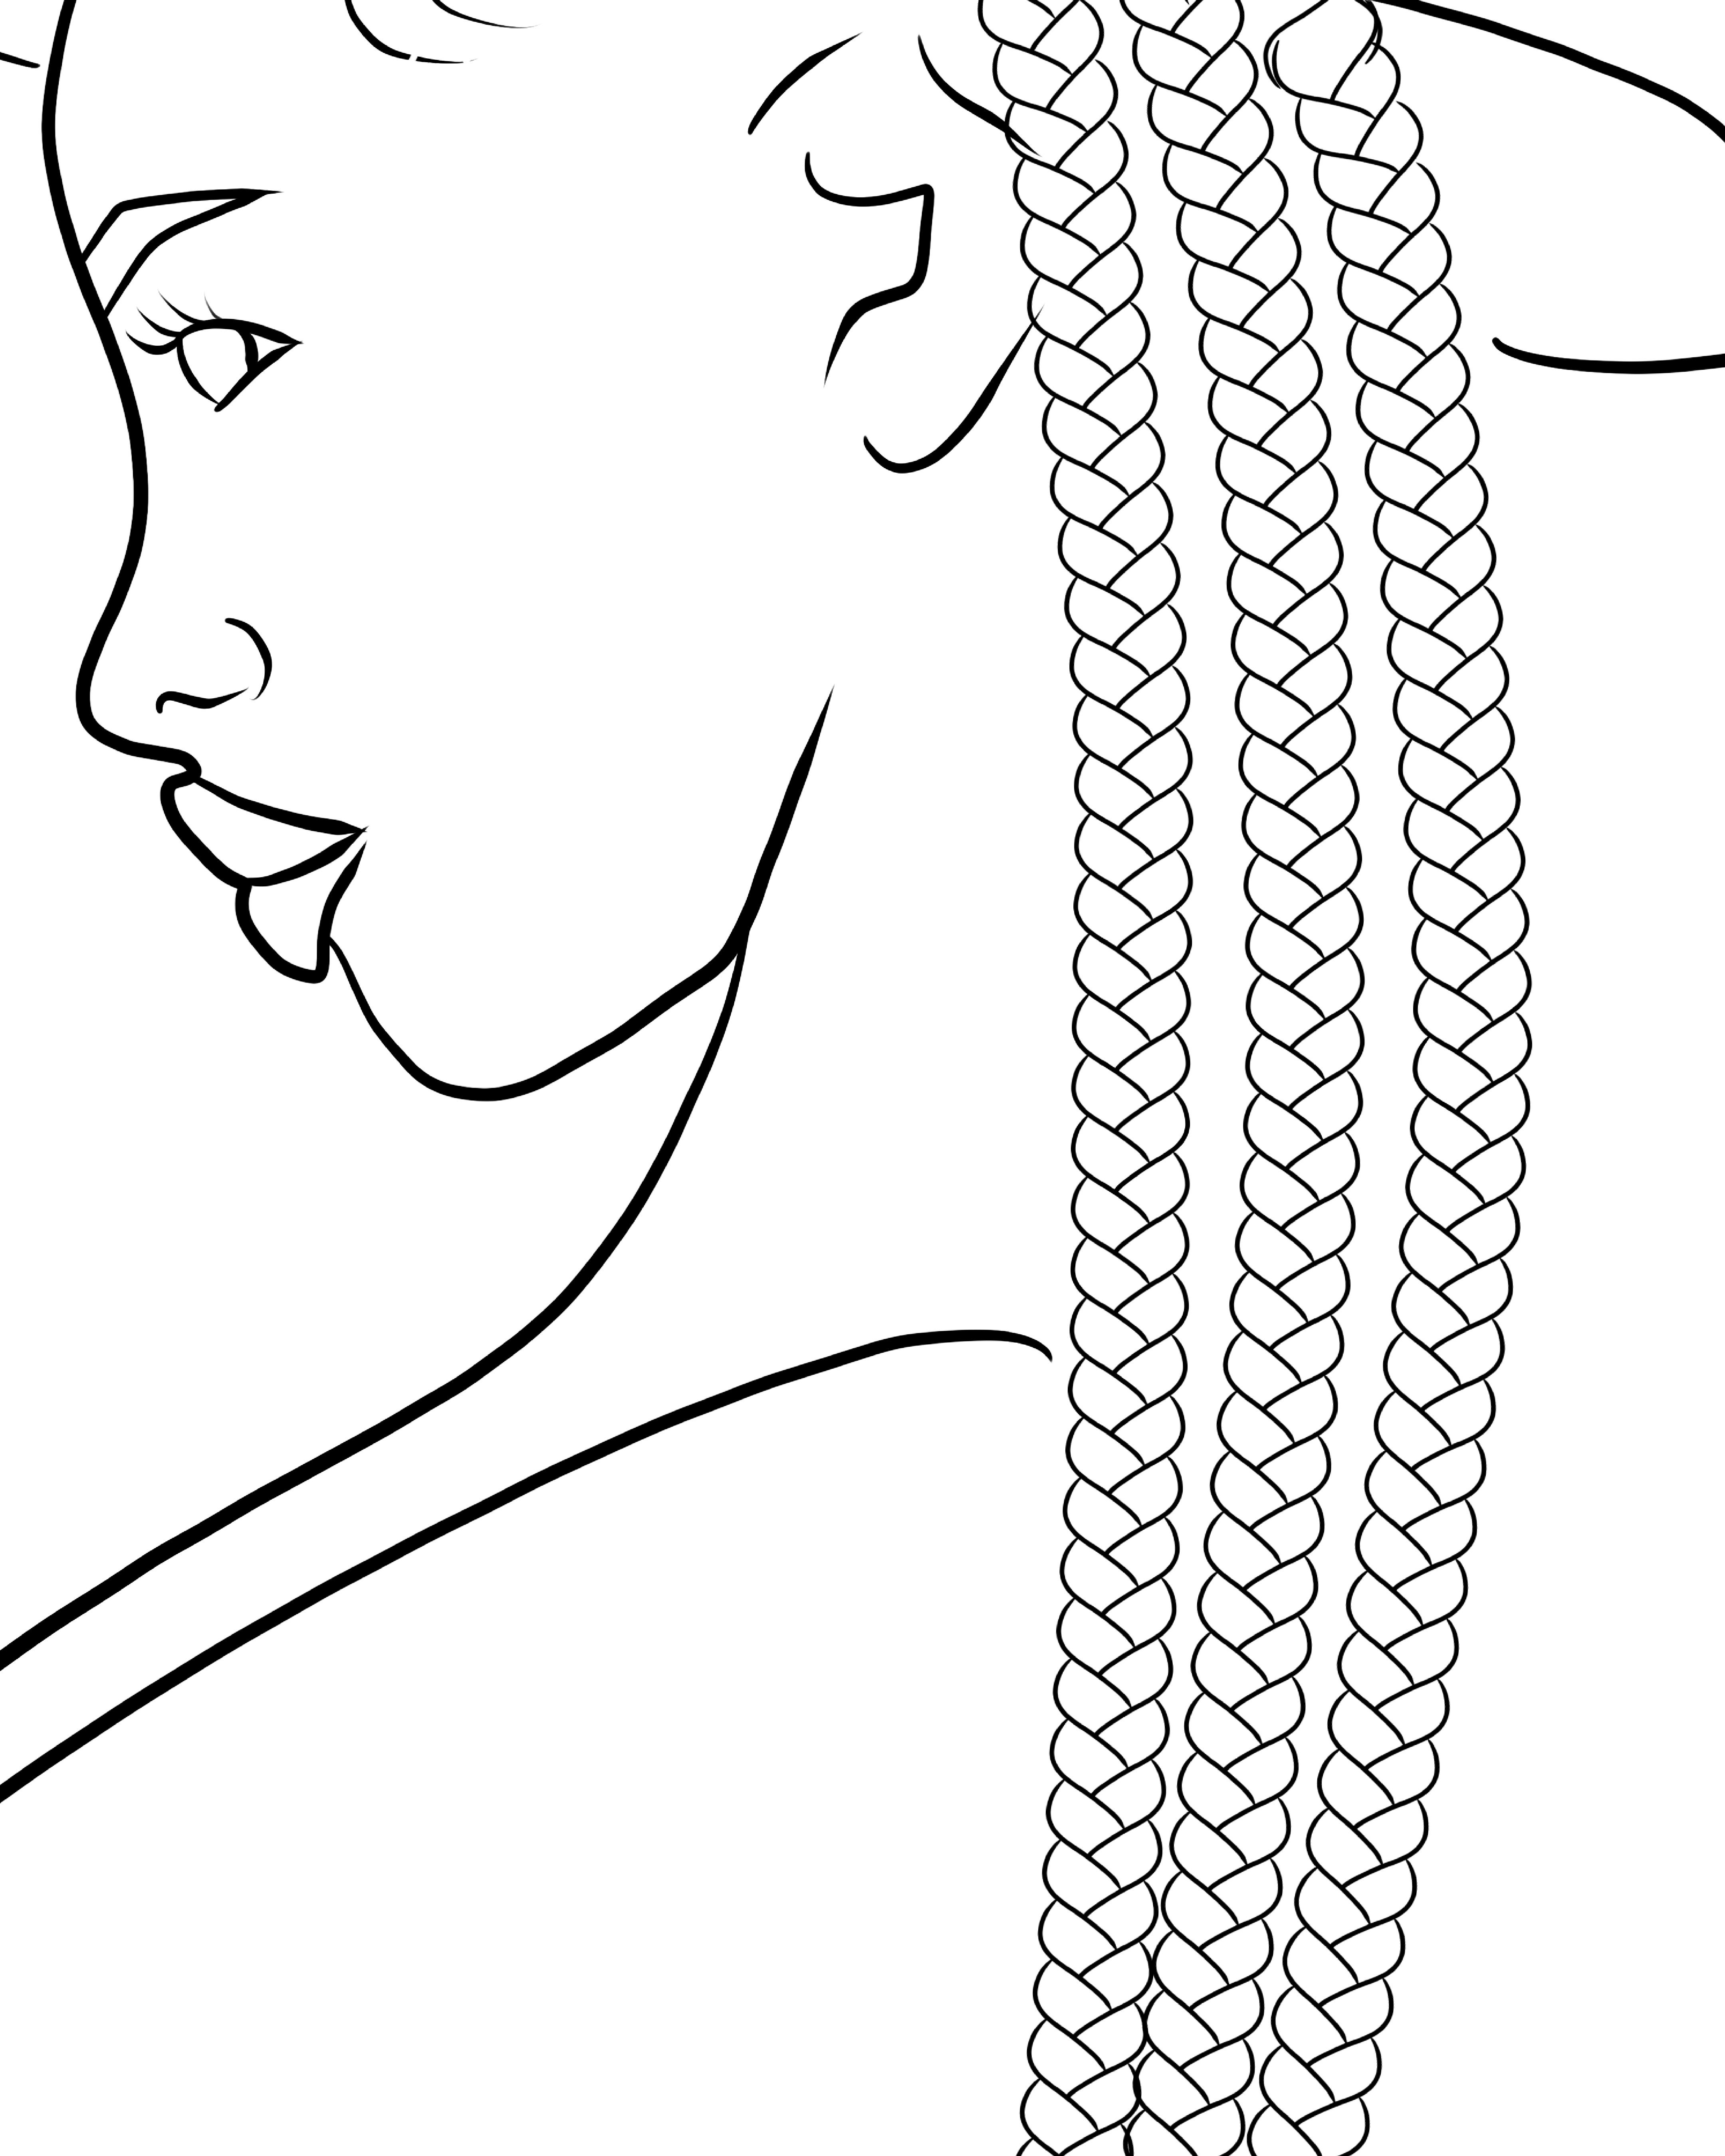 Procreate Braid Outline Brush